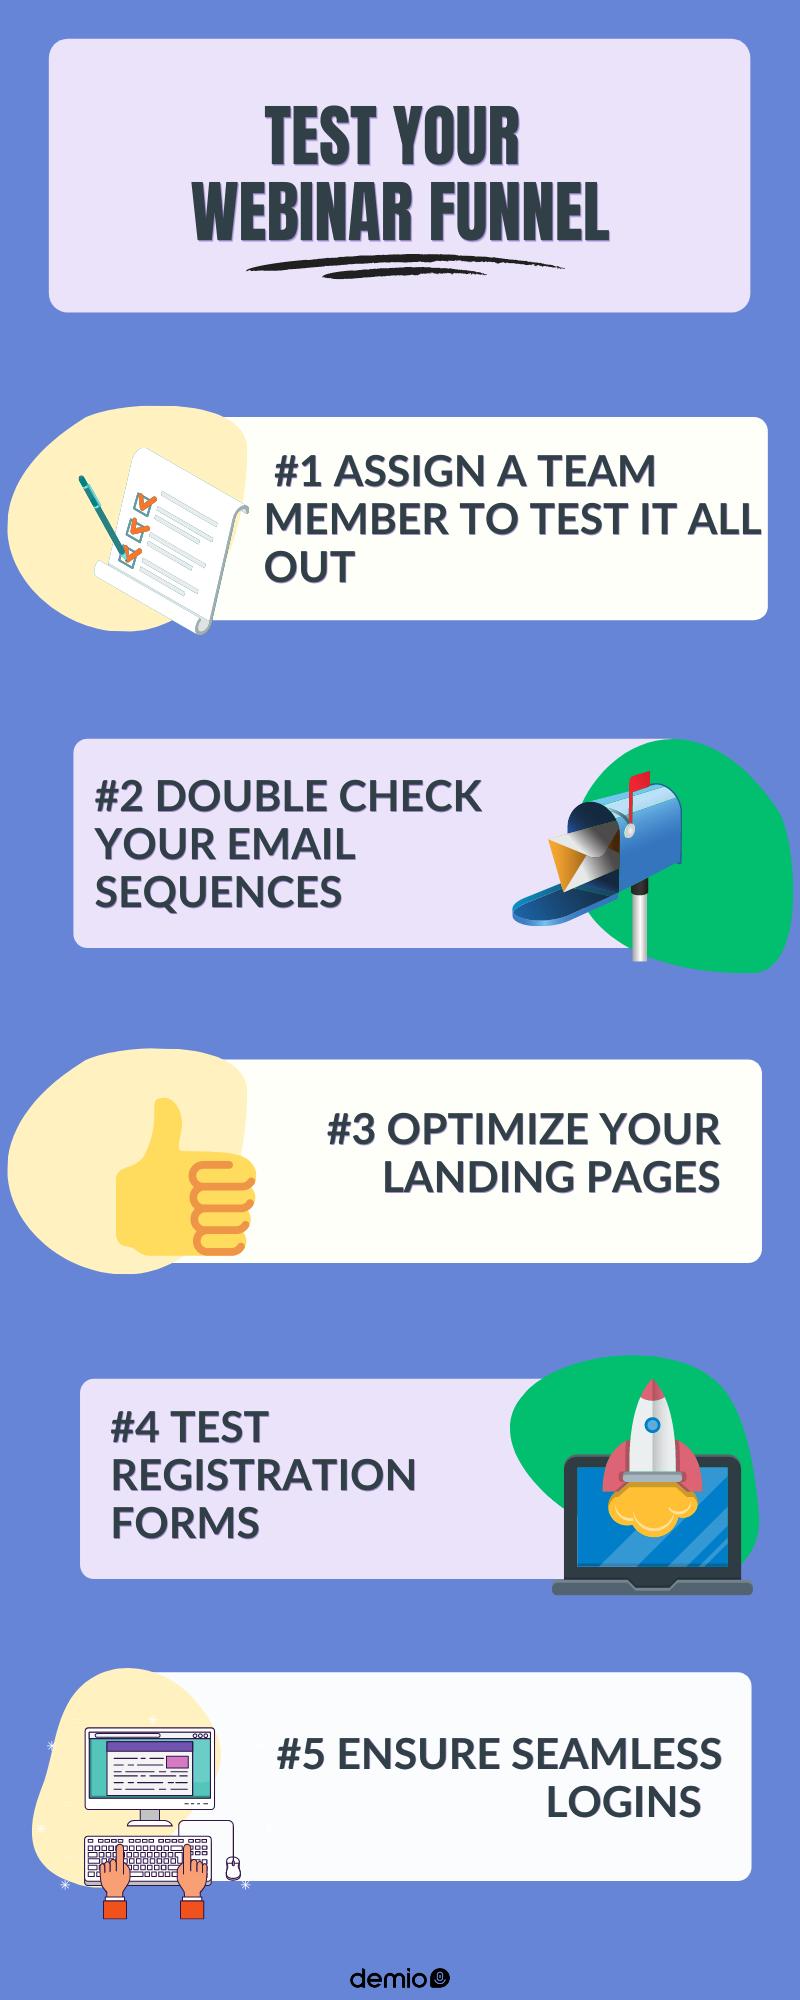 webinar funnel infographic